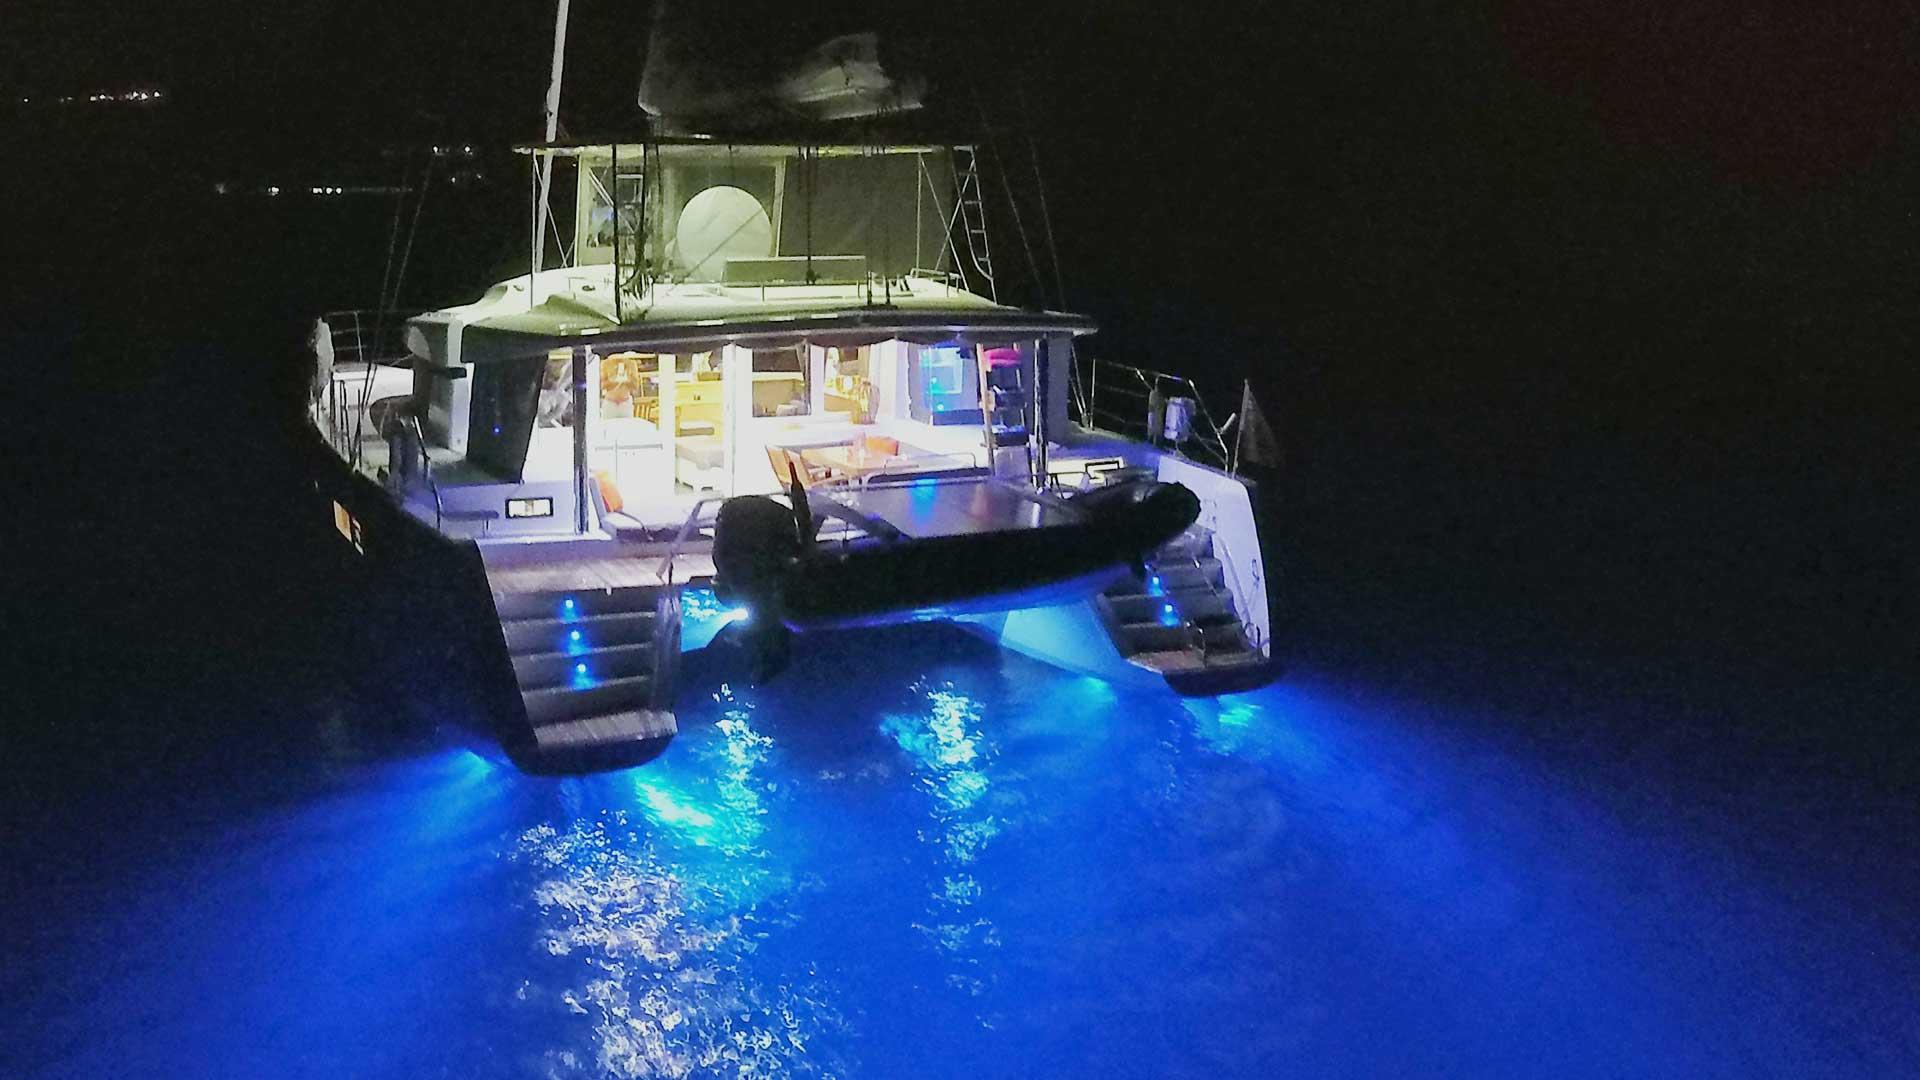 Underwaterlights on Crewed Charter Catamaran